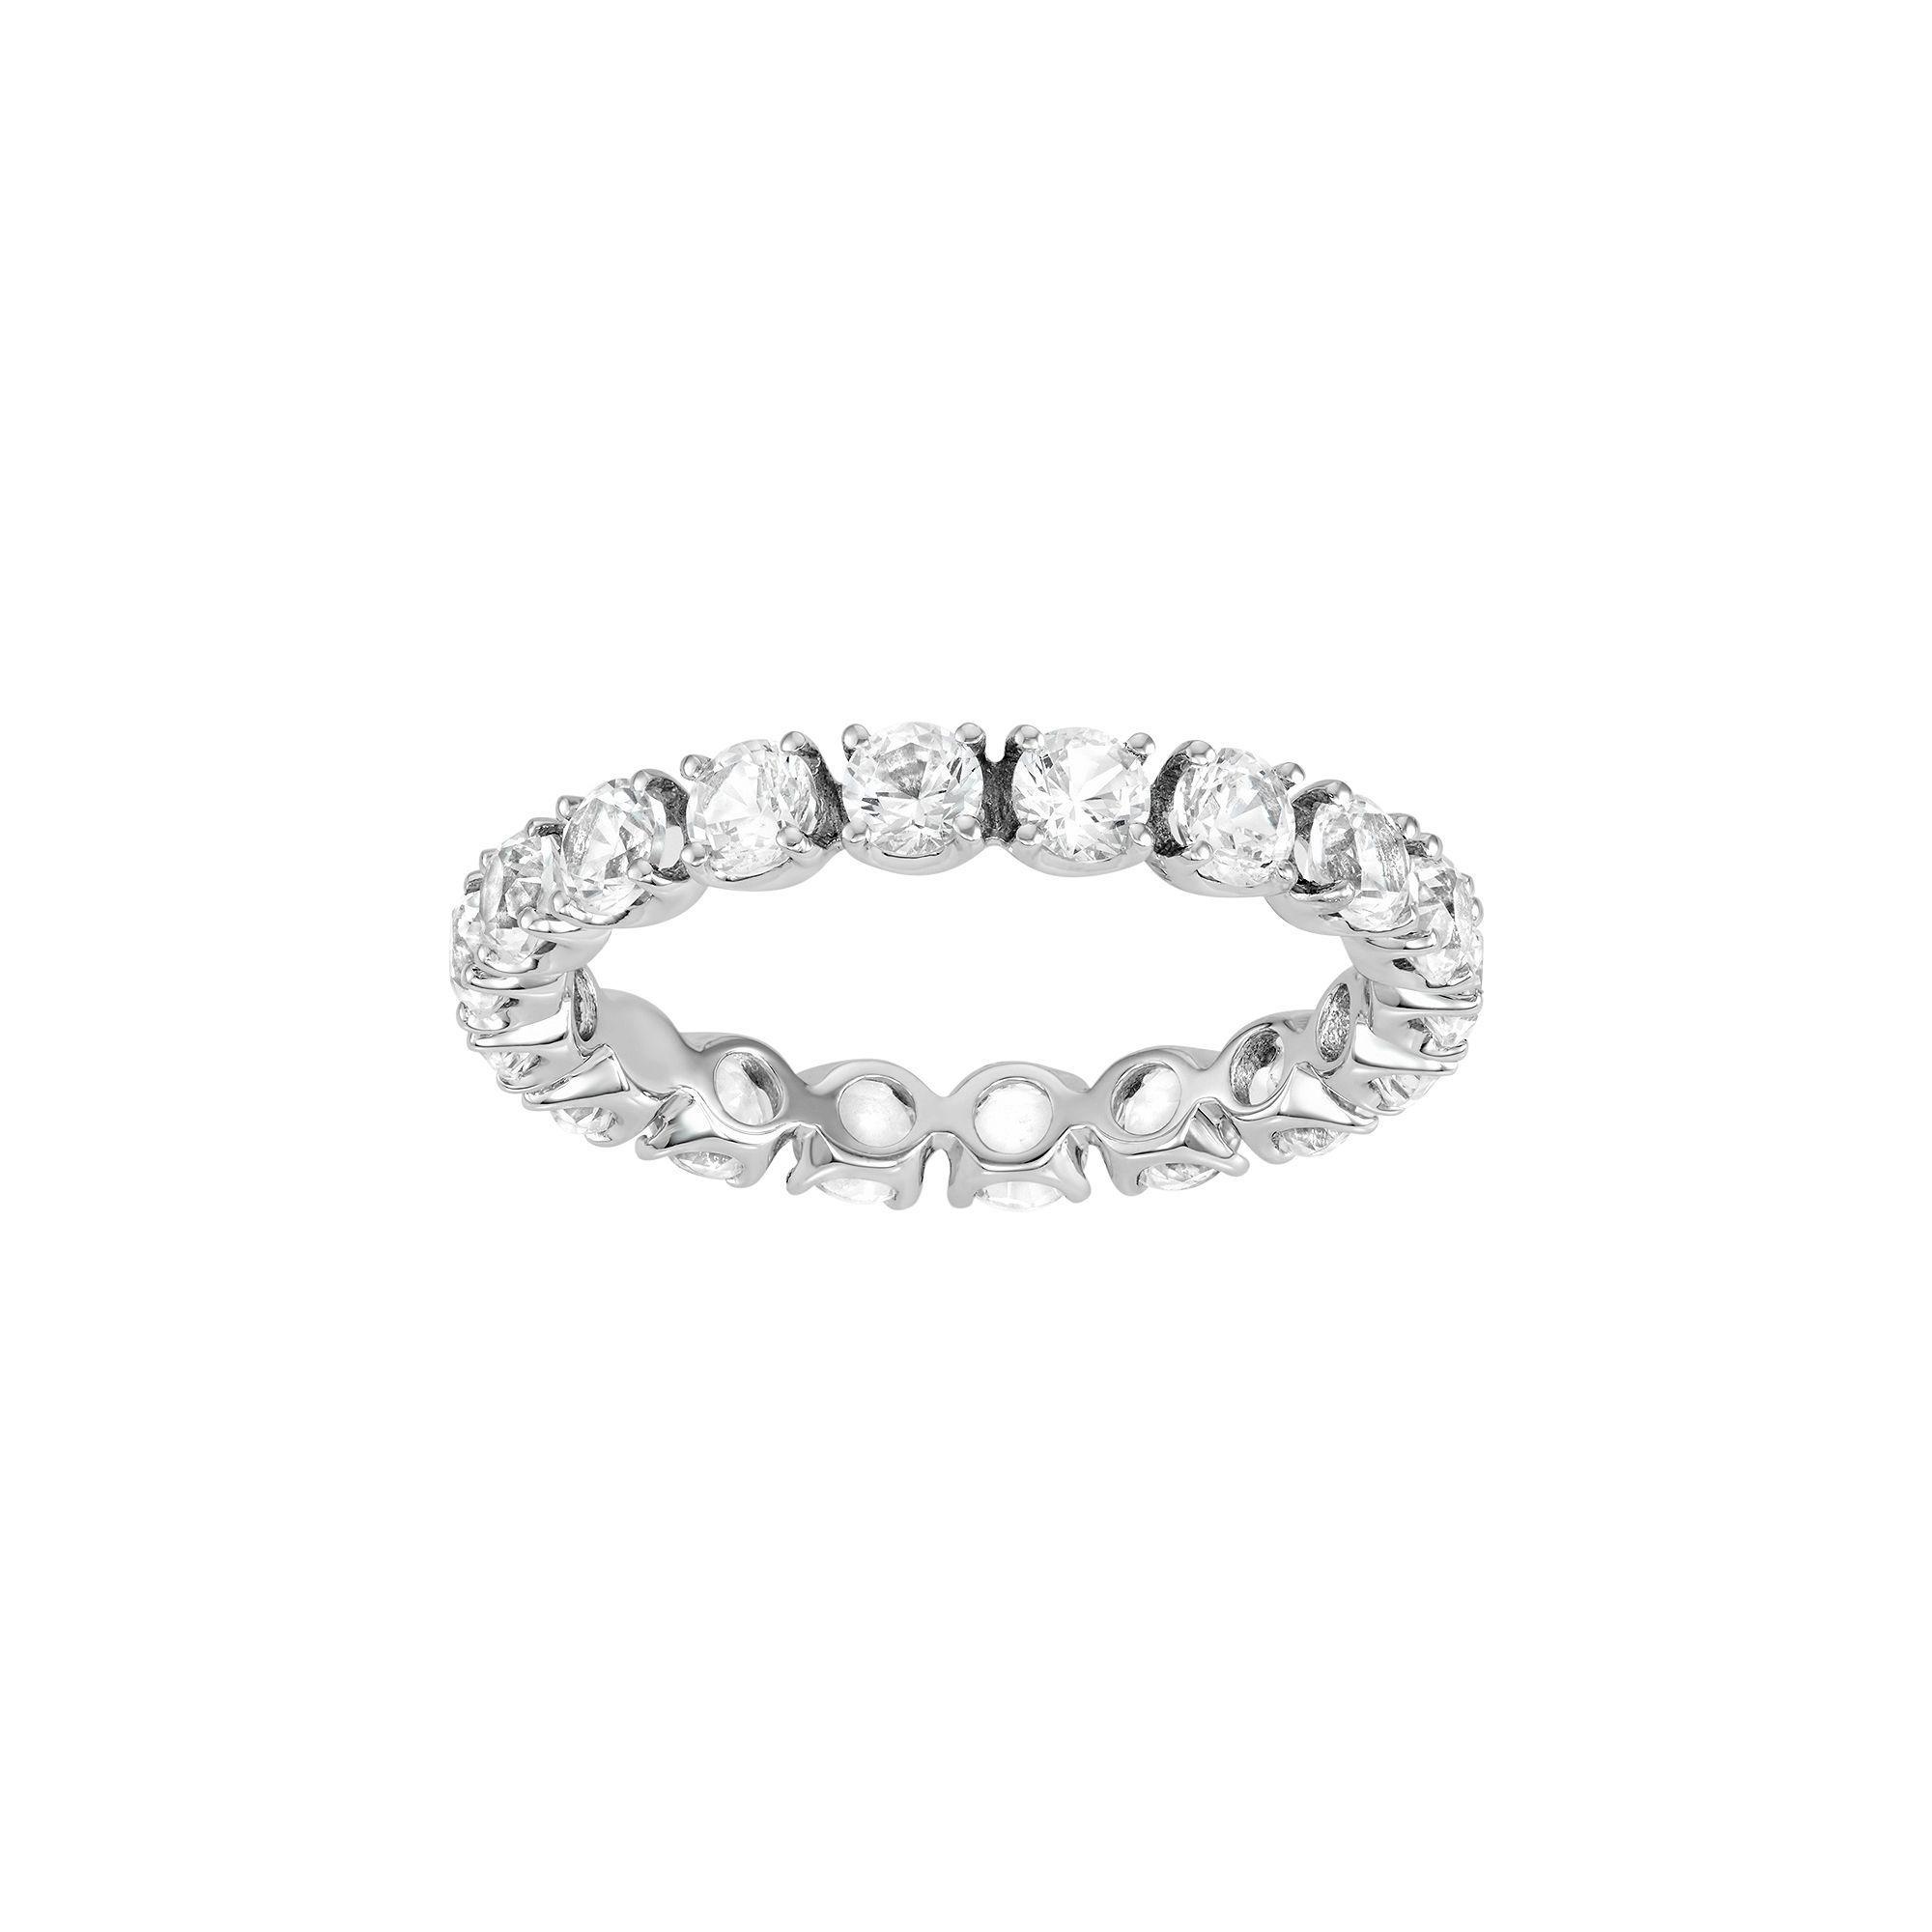 Aquamarine Lab Created White Sapphire Ring In 10k White Gold White Sapphire Ring White Gold Rings White Sapphire